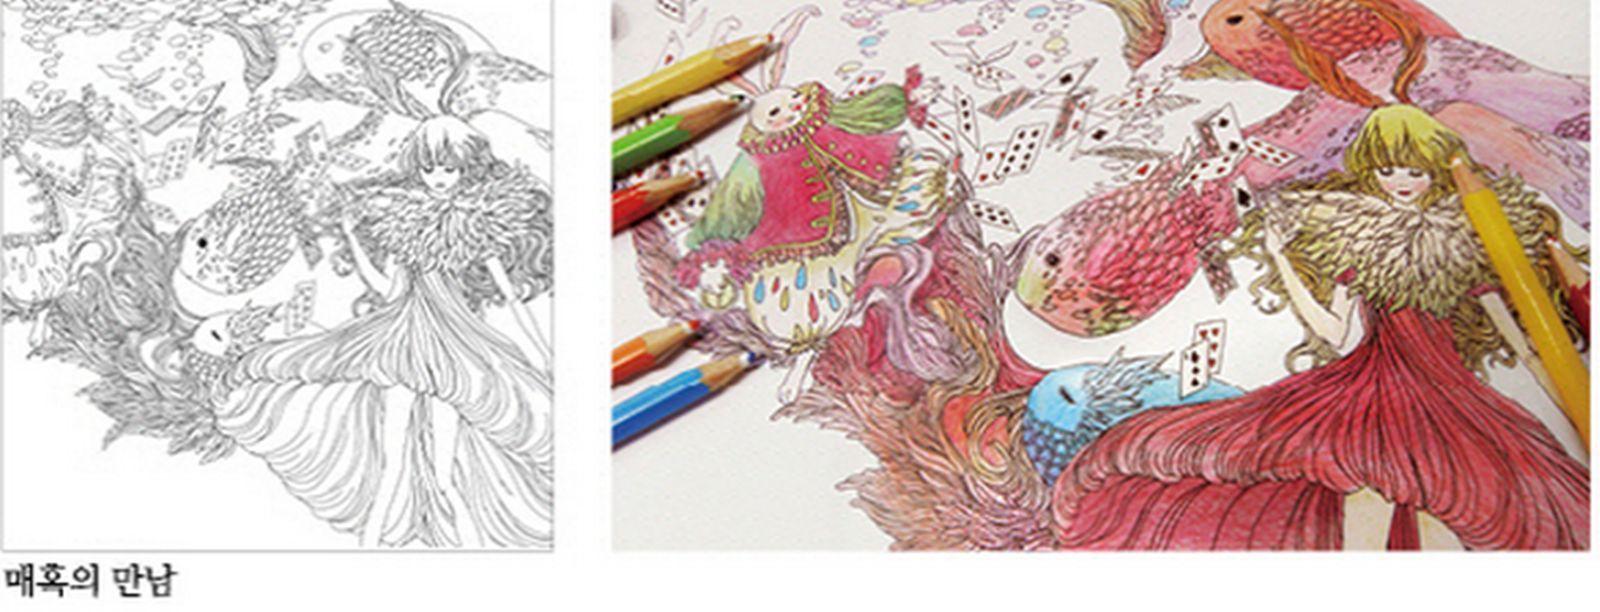 Pandora Coloring Book Anti Stress Enchanting Fantasy Trip Adult Art Therapy New